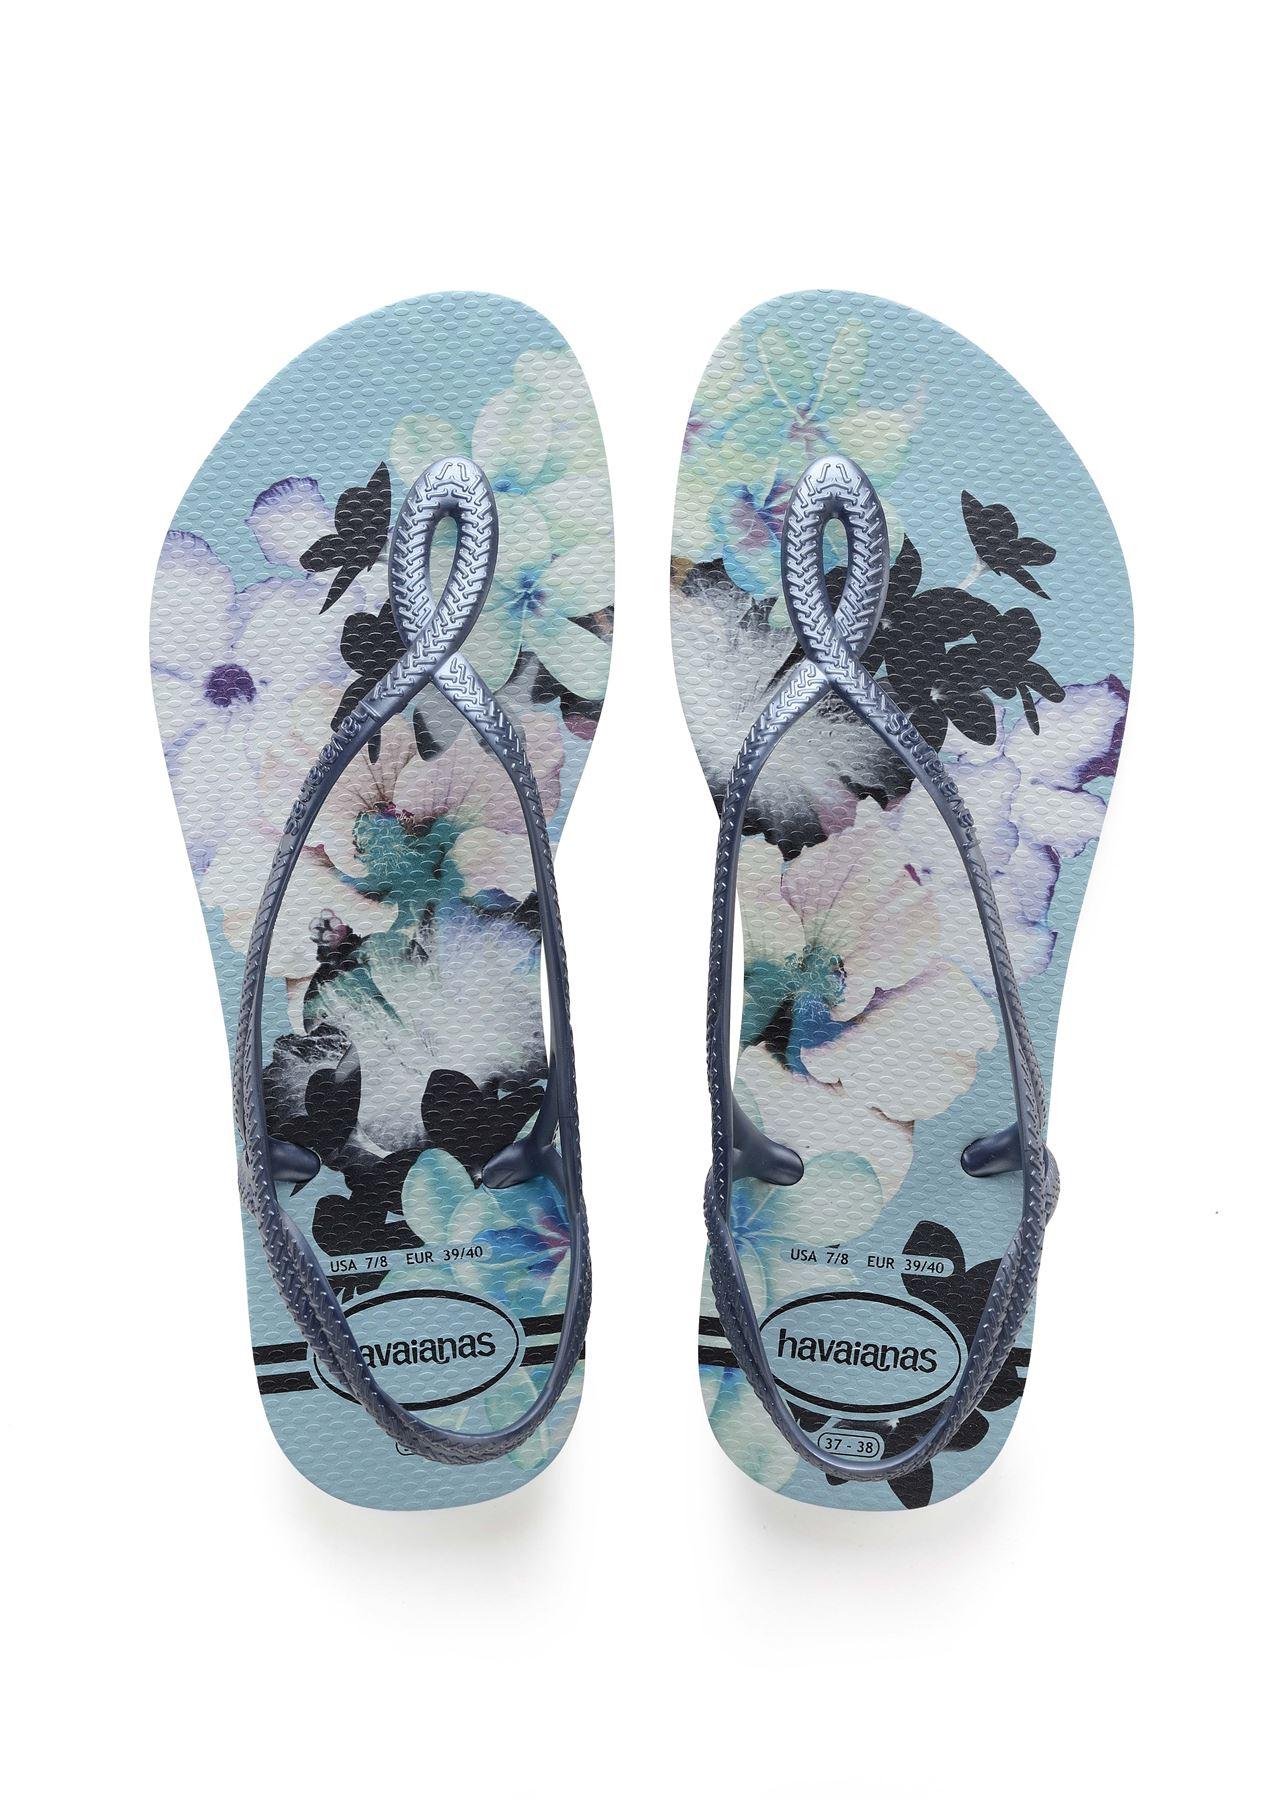 4c9ba6077f07 Havaianas Luna Floral Print Flip Flops Beach Pool Sling Back Strap ...